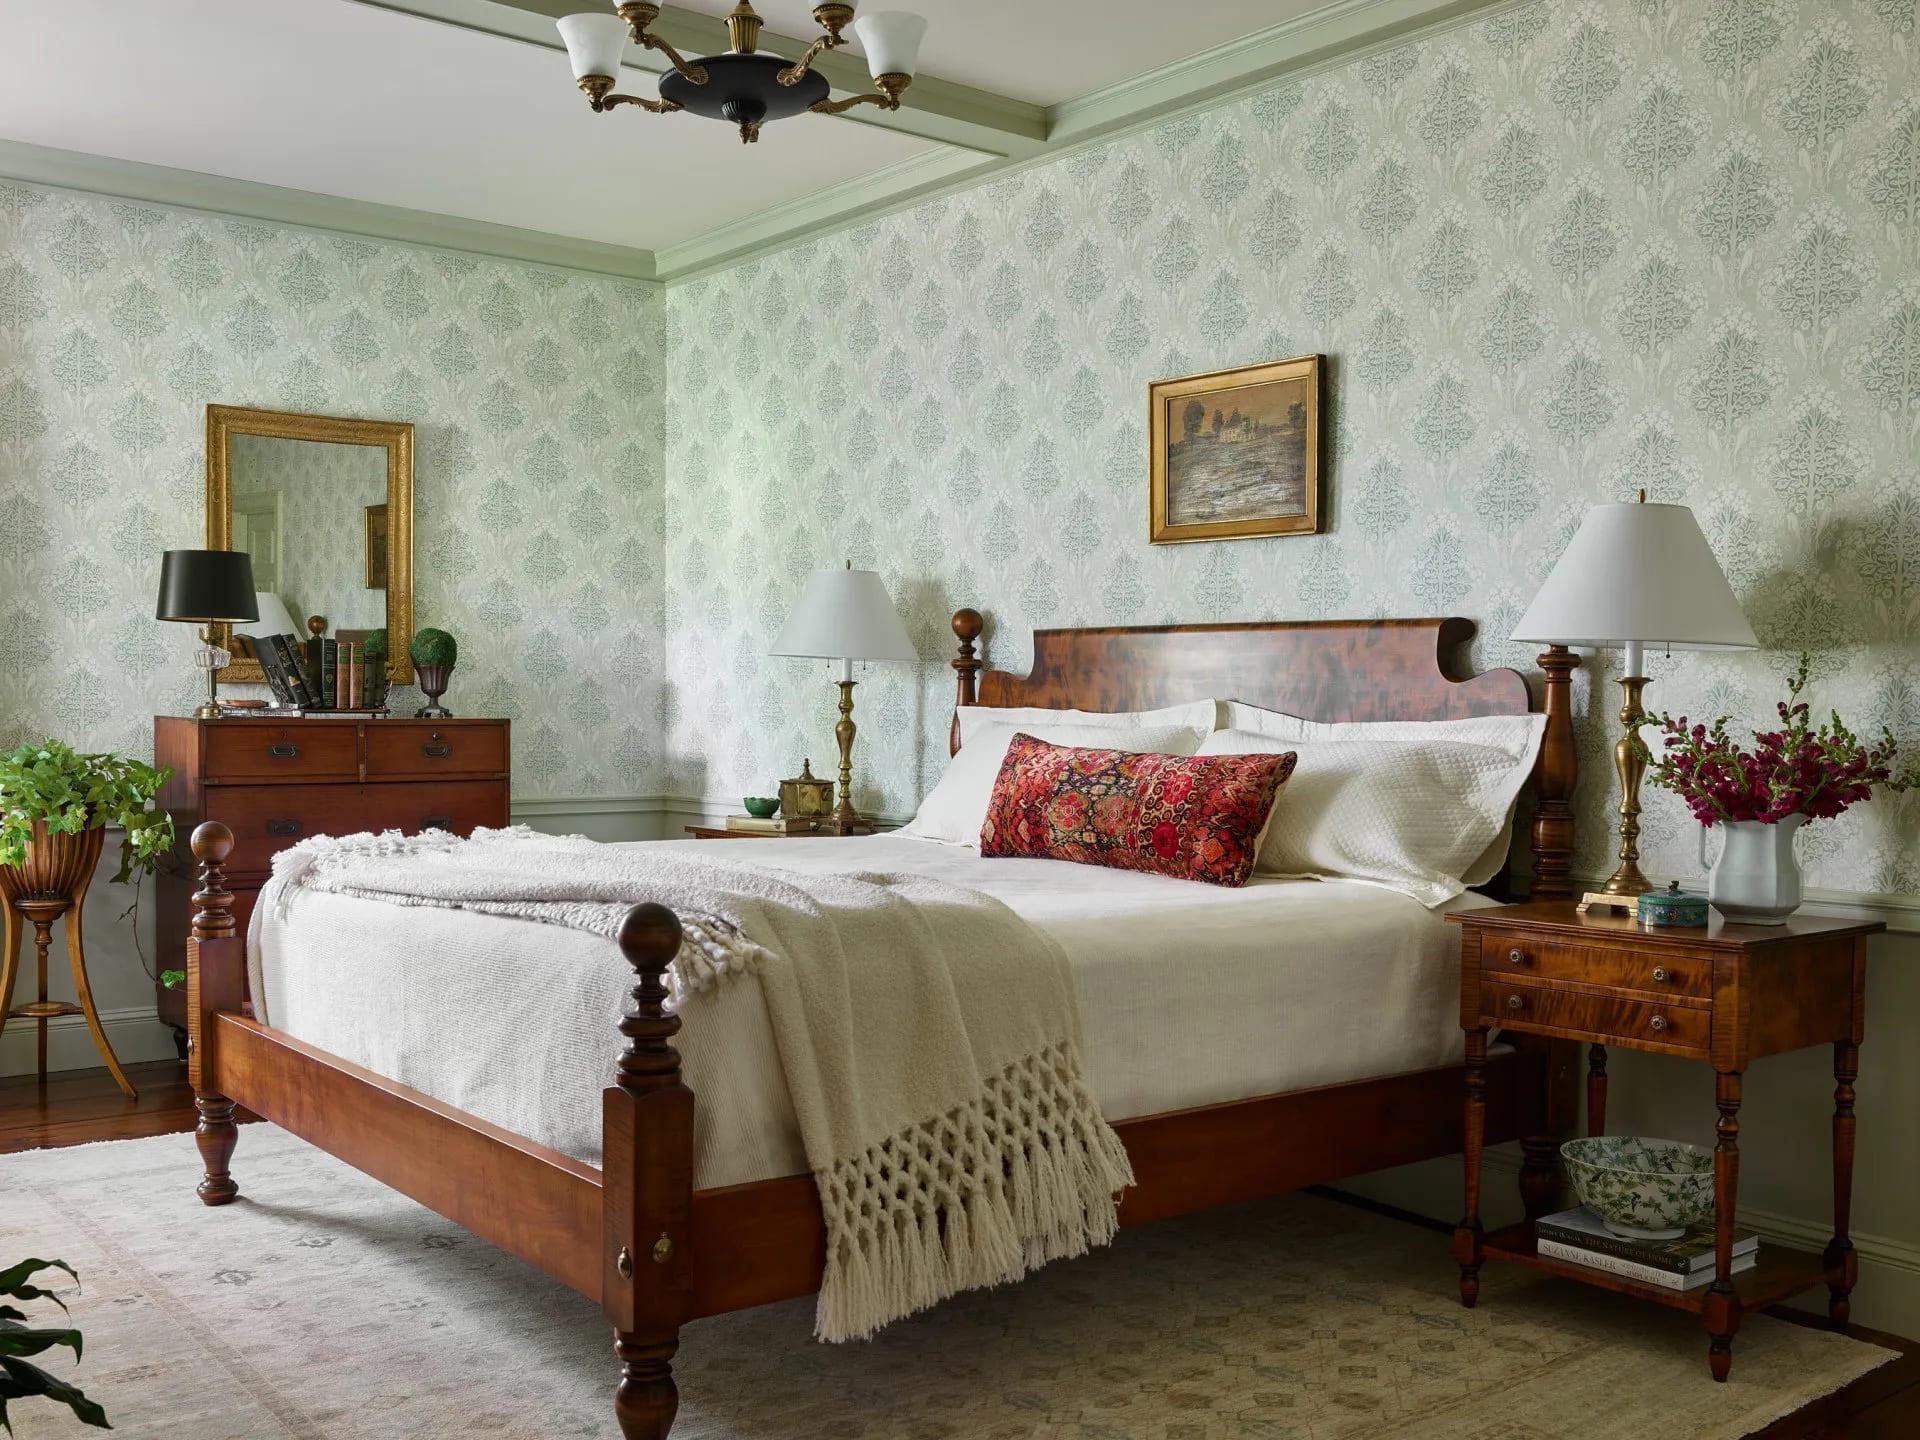 Lwinteriors Goodnowsudbury Bed Small 1920w